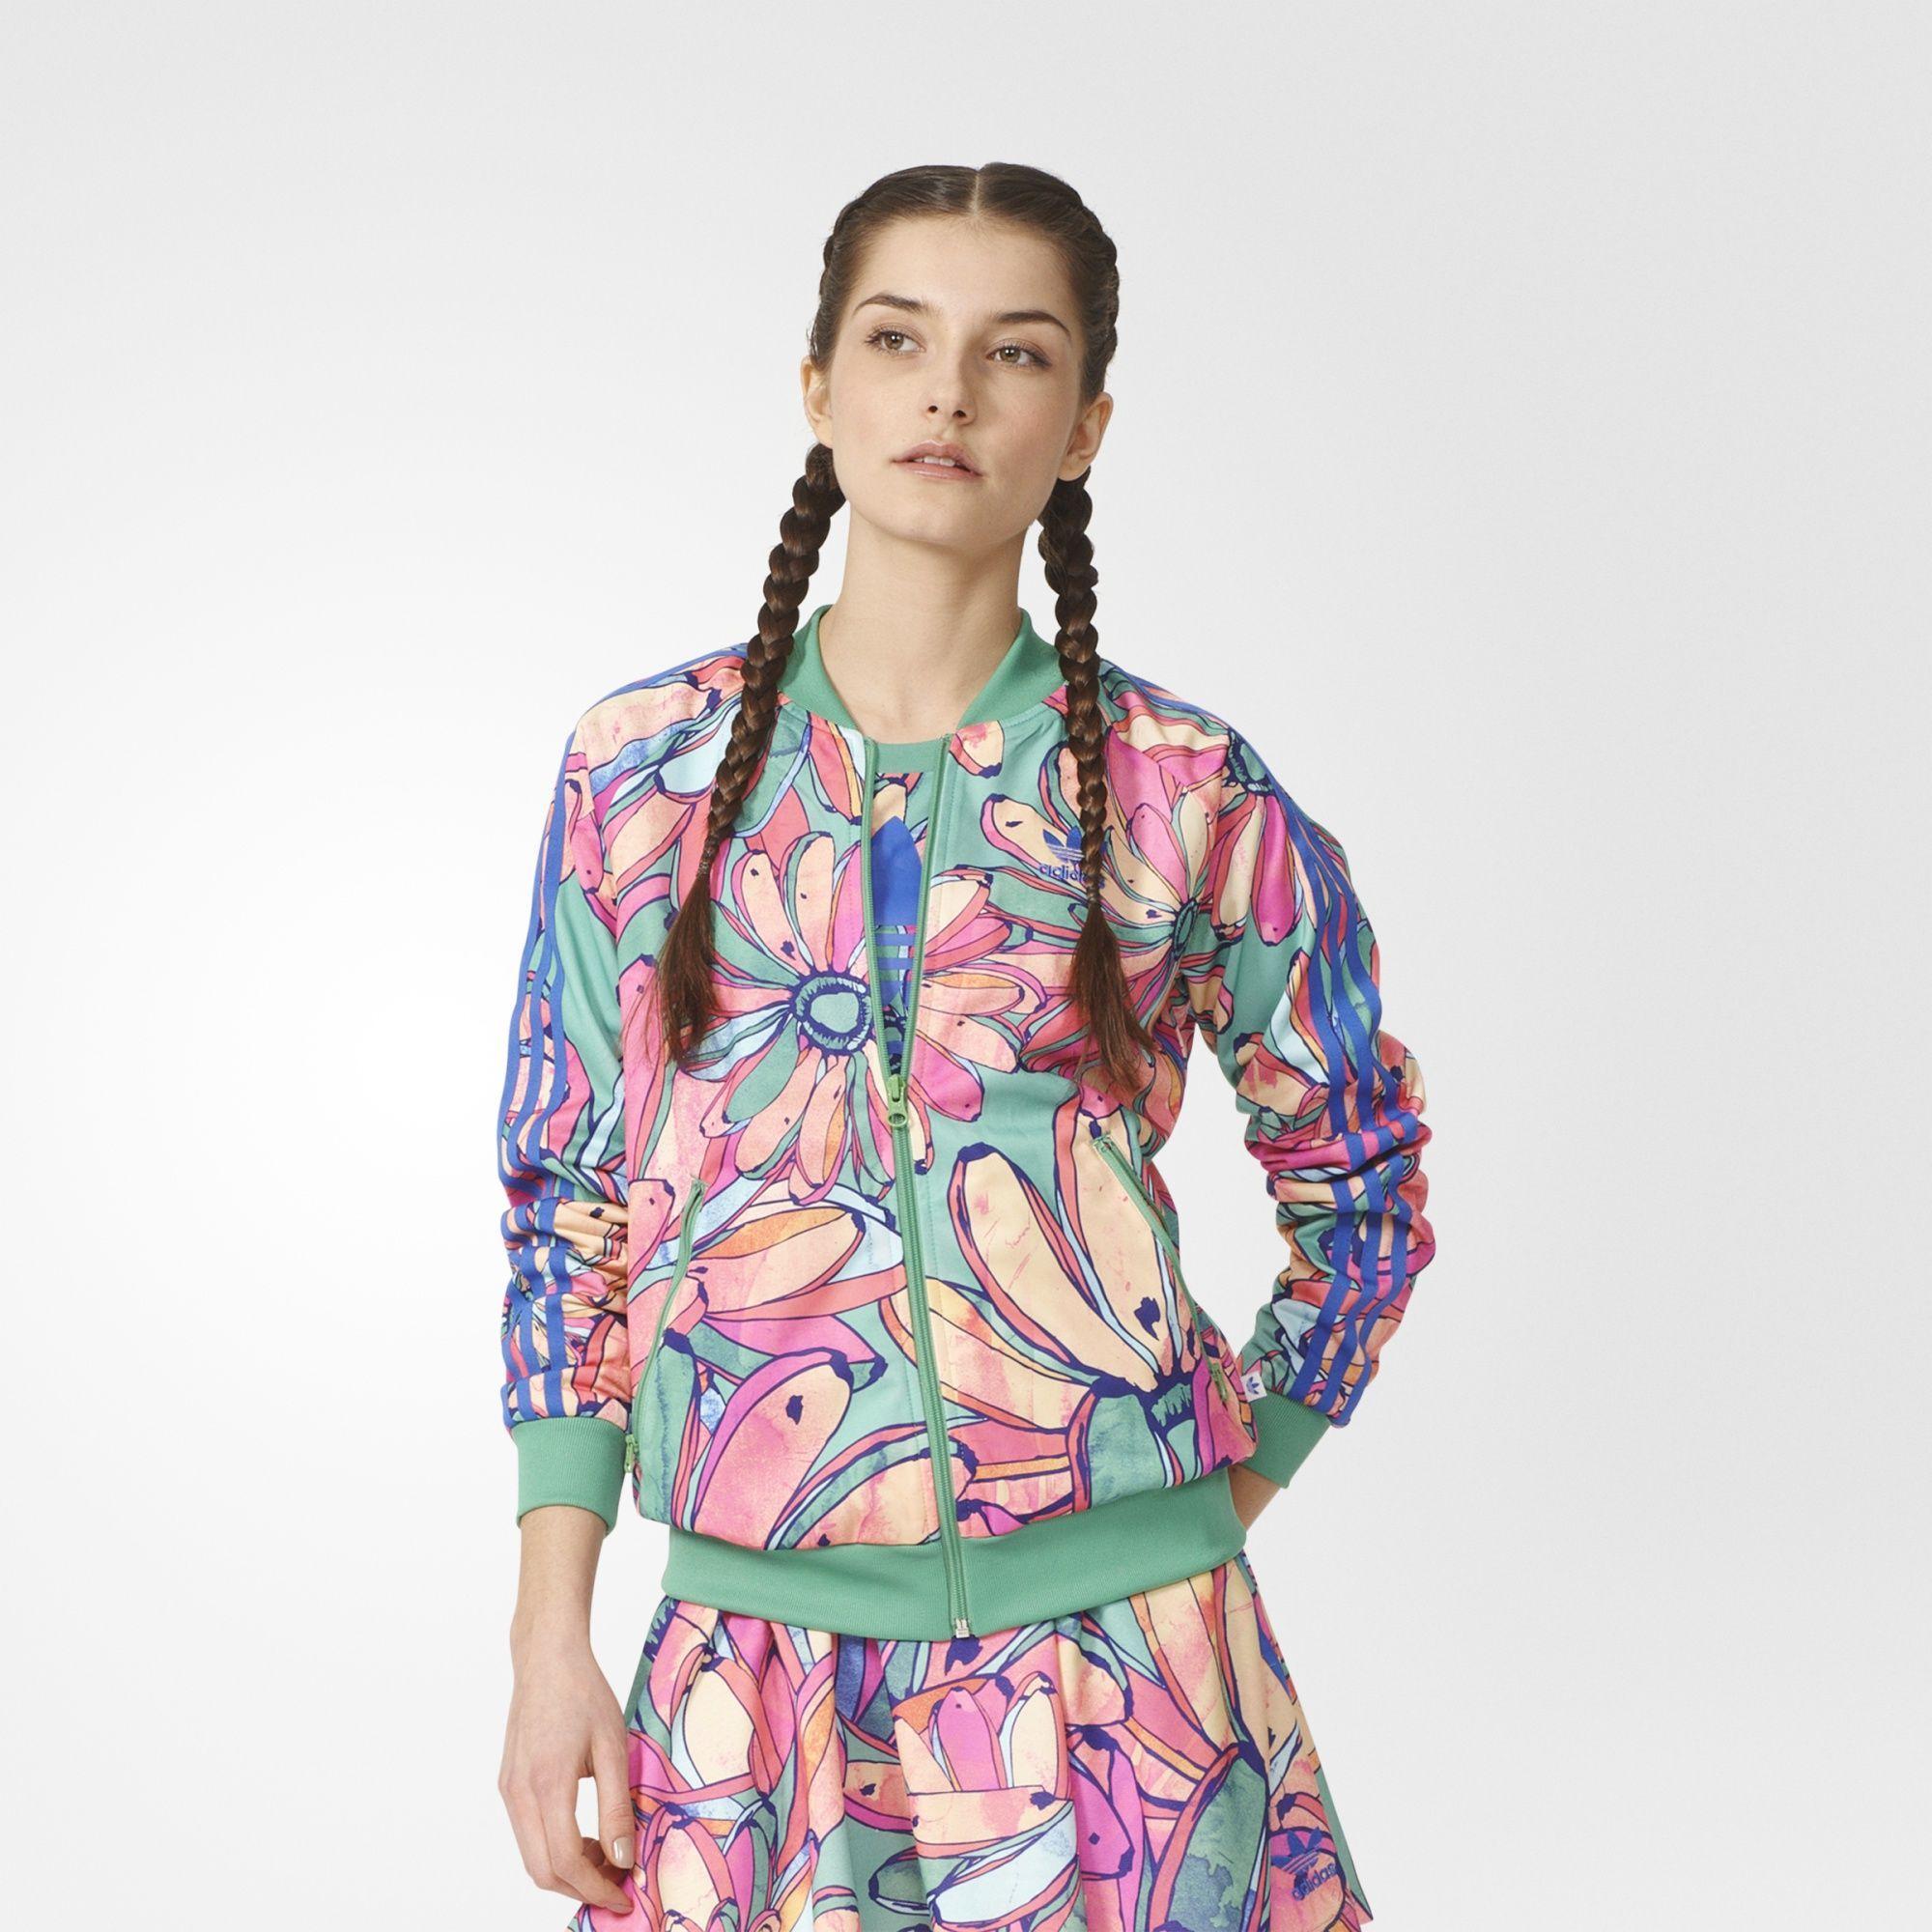 Bananas Bomber Supergirl Adidas Jacket Chaqueta Pinterest YqFnPzx